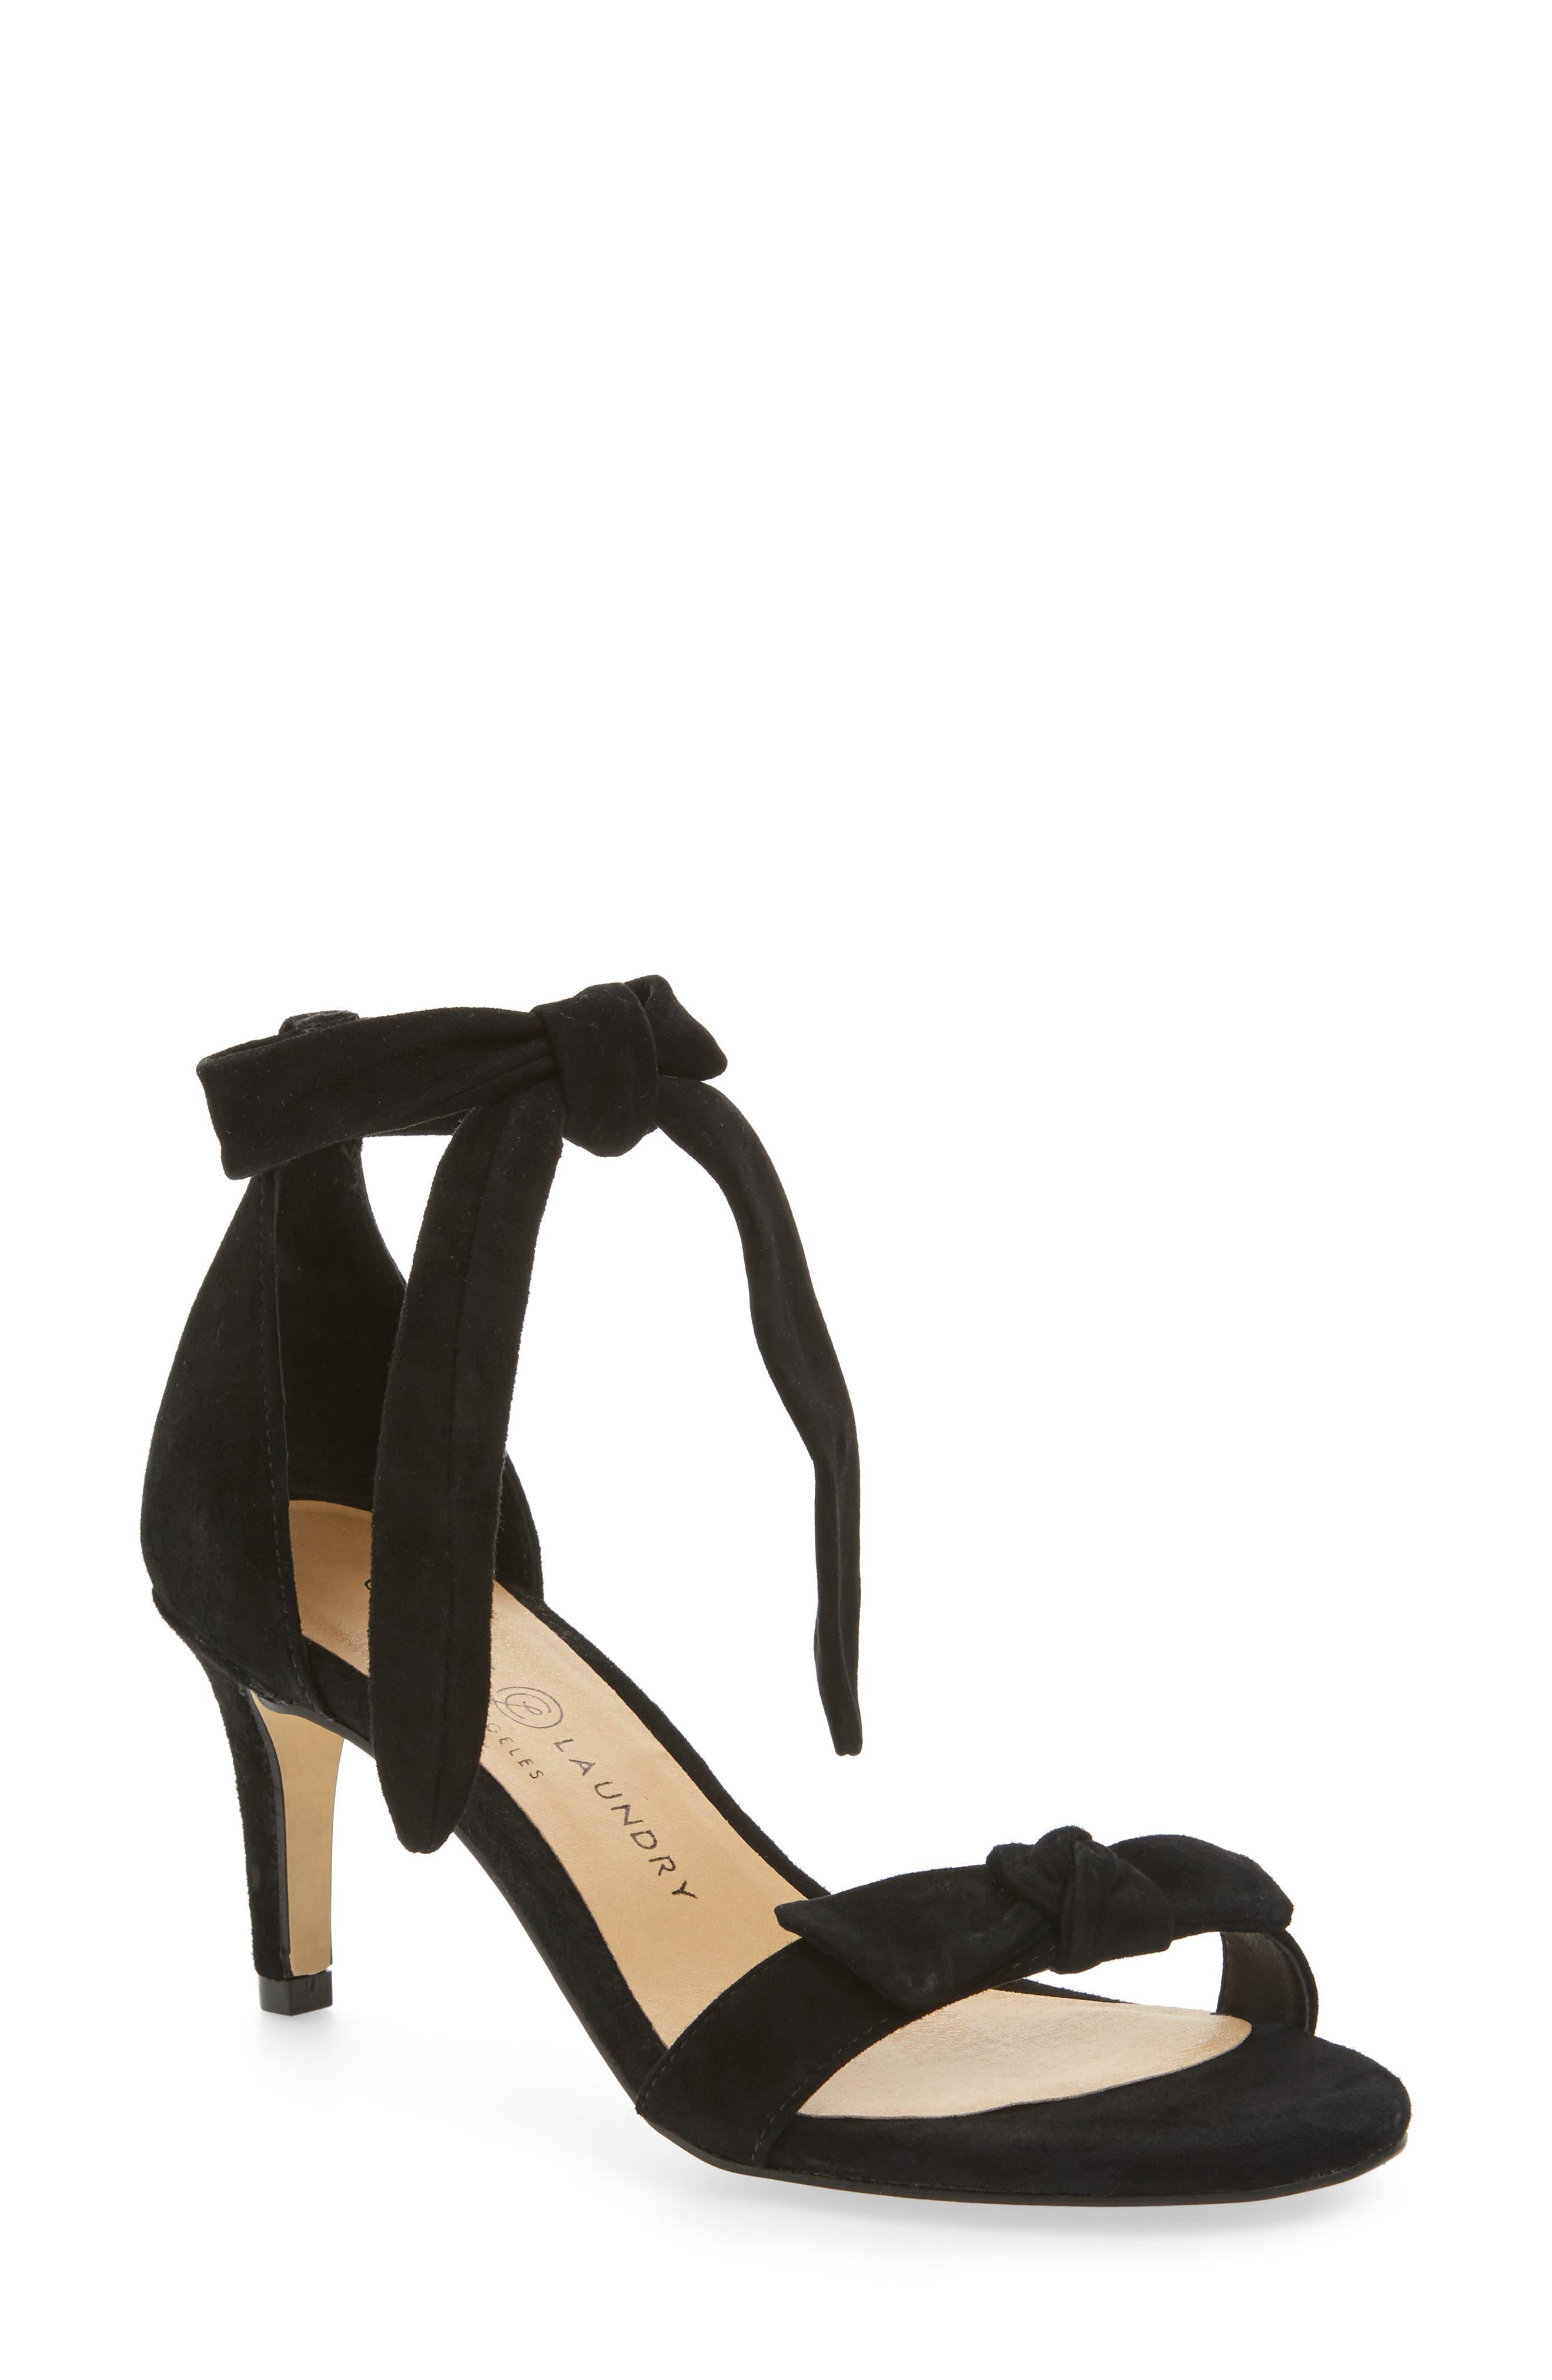 Main Image - Chinese Laundry Rhonda Ankle Tie Sandal (Women)